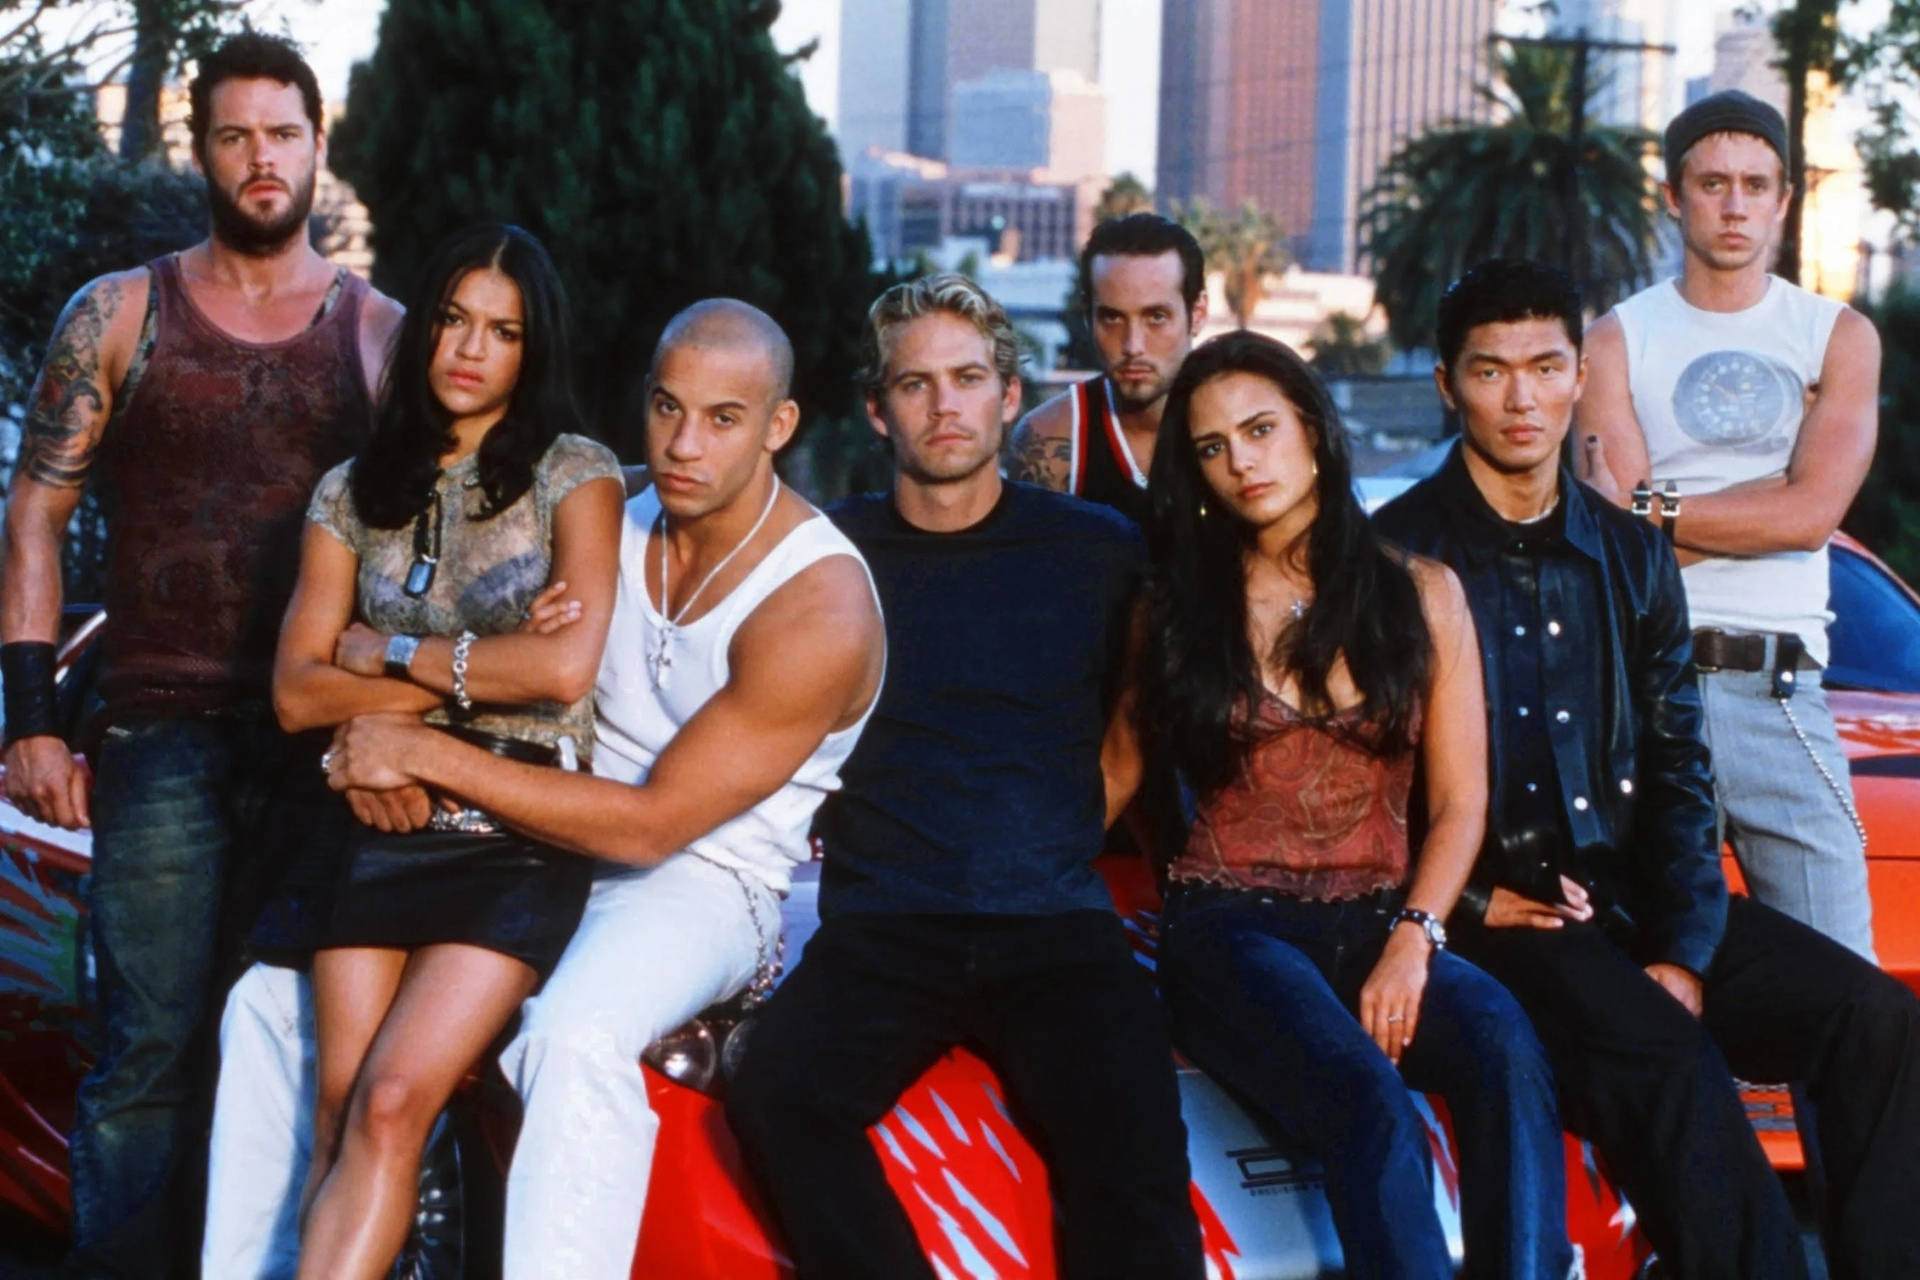 nhan vat cua Vin Diesel trong Fast & Furious anh 5